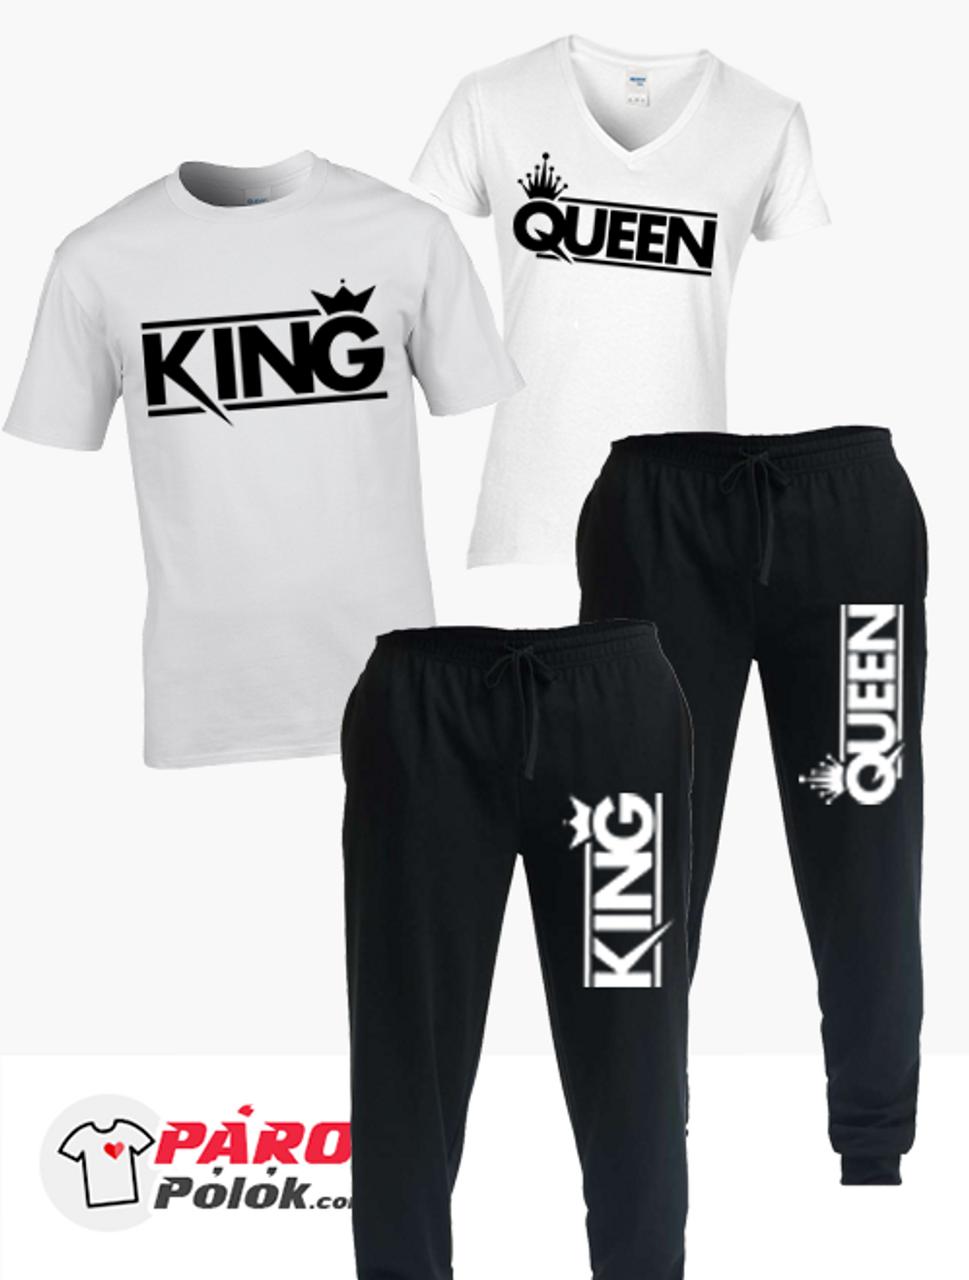 Modern King and Queen nadrág + póló csomag - Párospólók.com 435ede8726